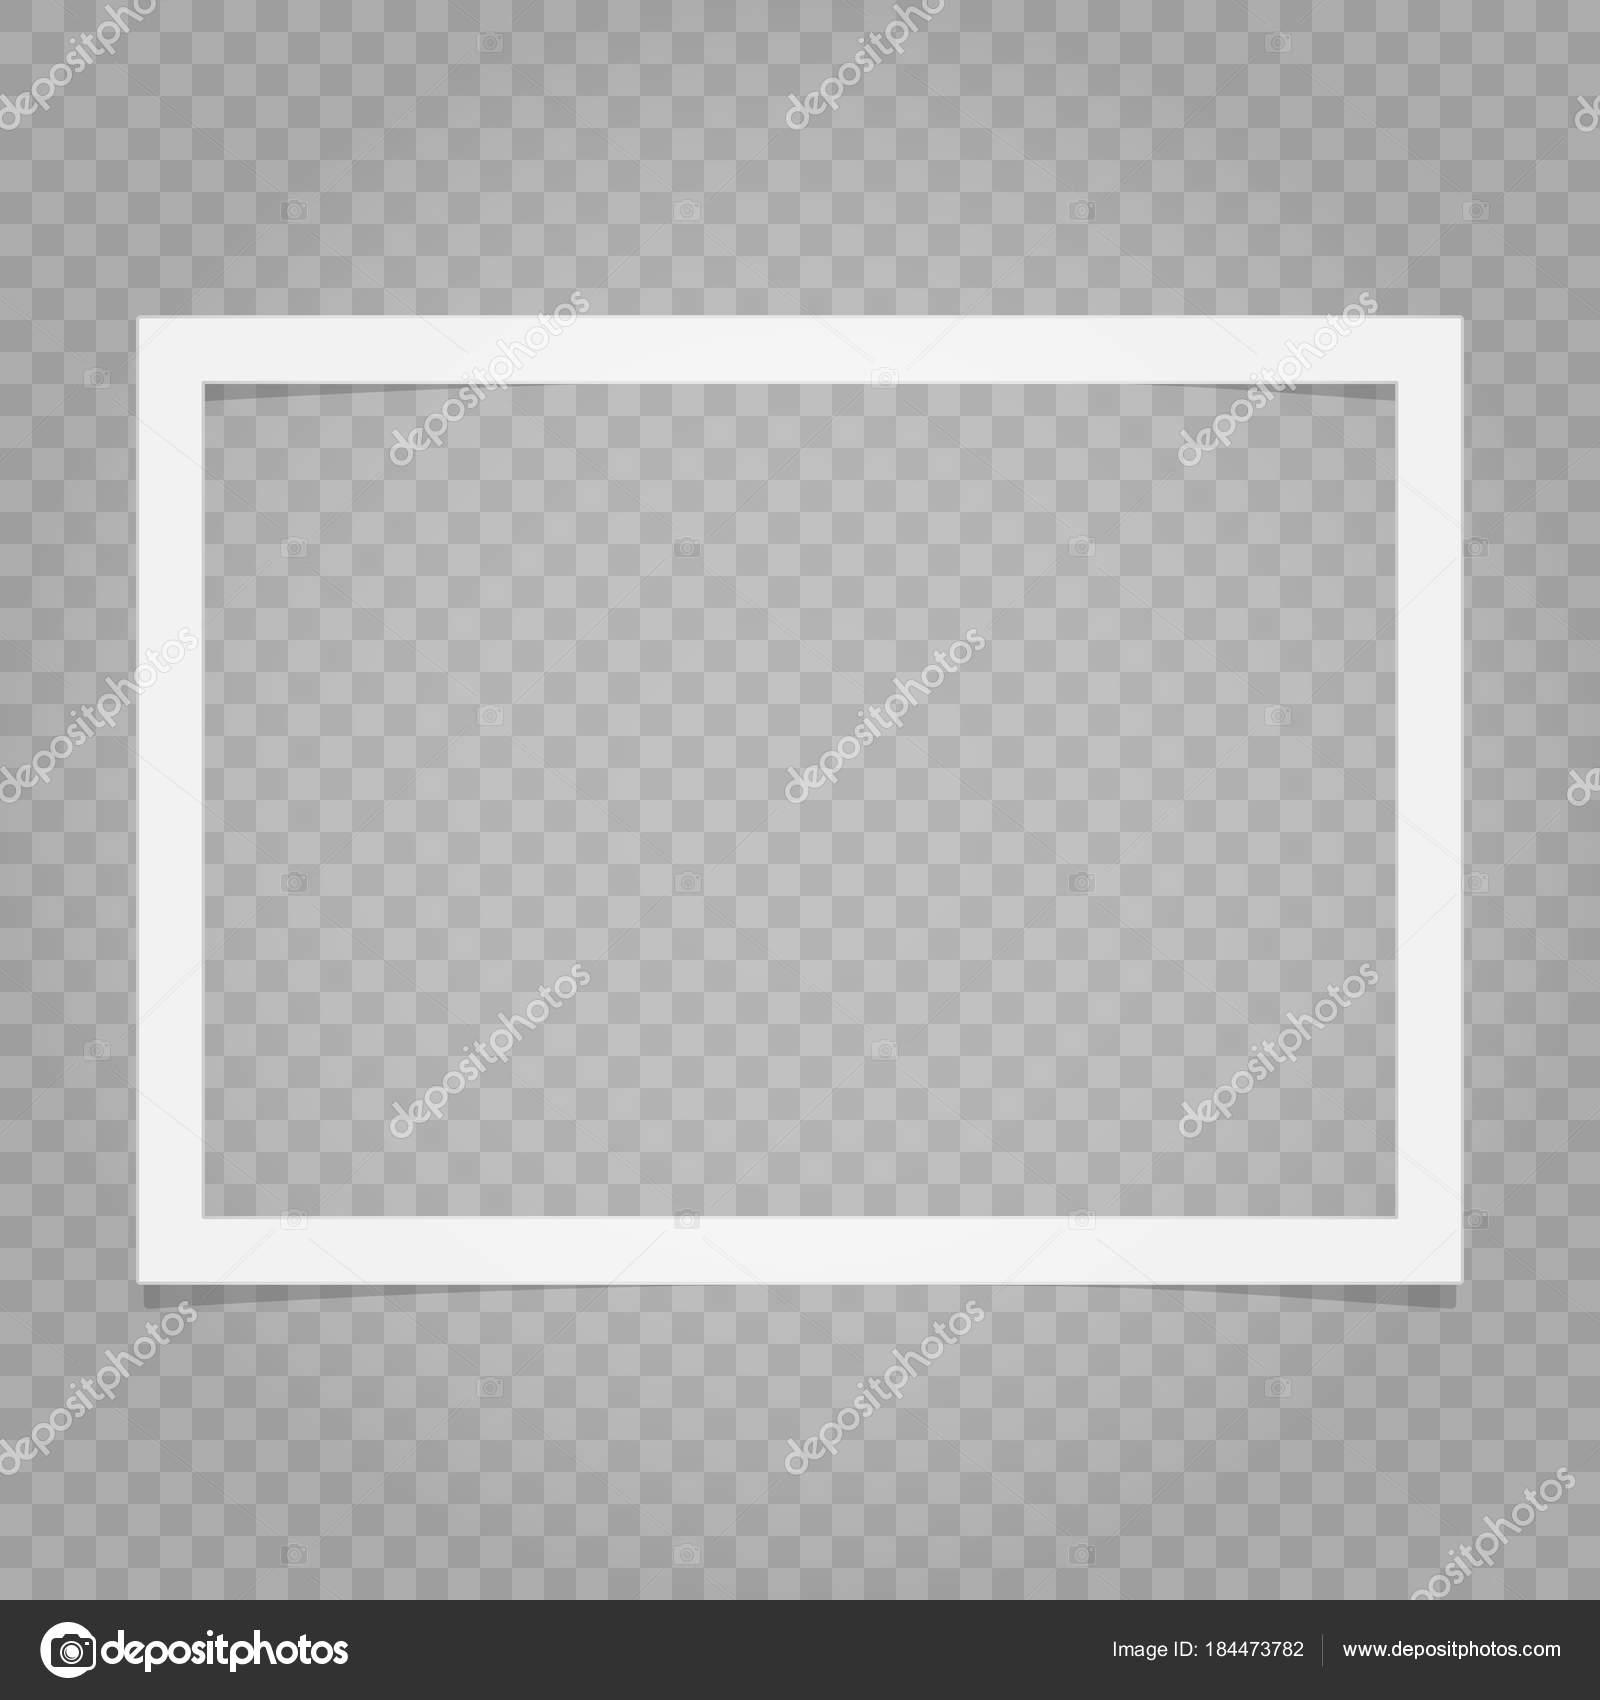 Vektor-Bild transparent Fotorahmen — Stockvektor © MaksimAnkuda ...